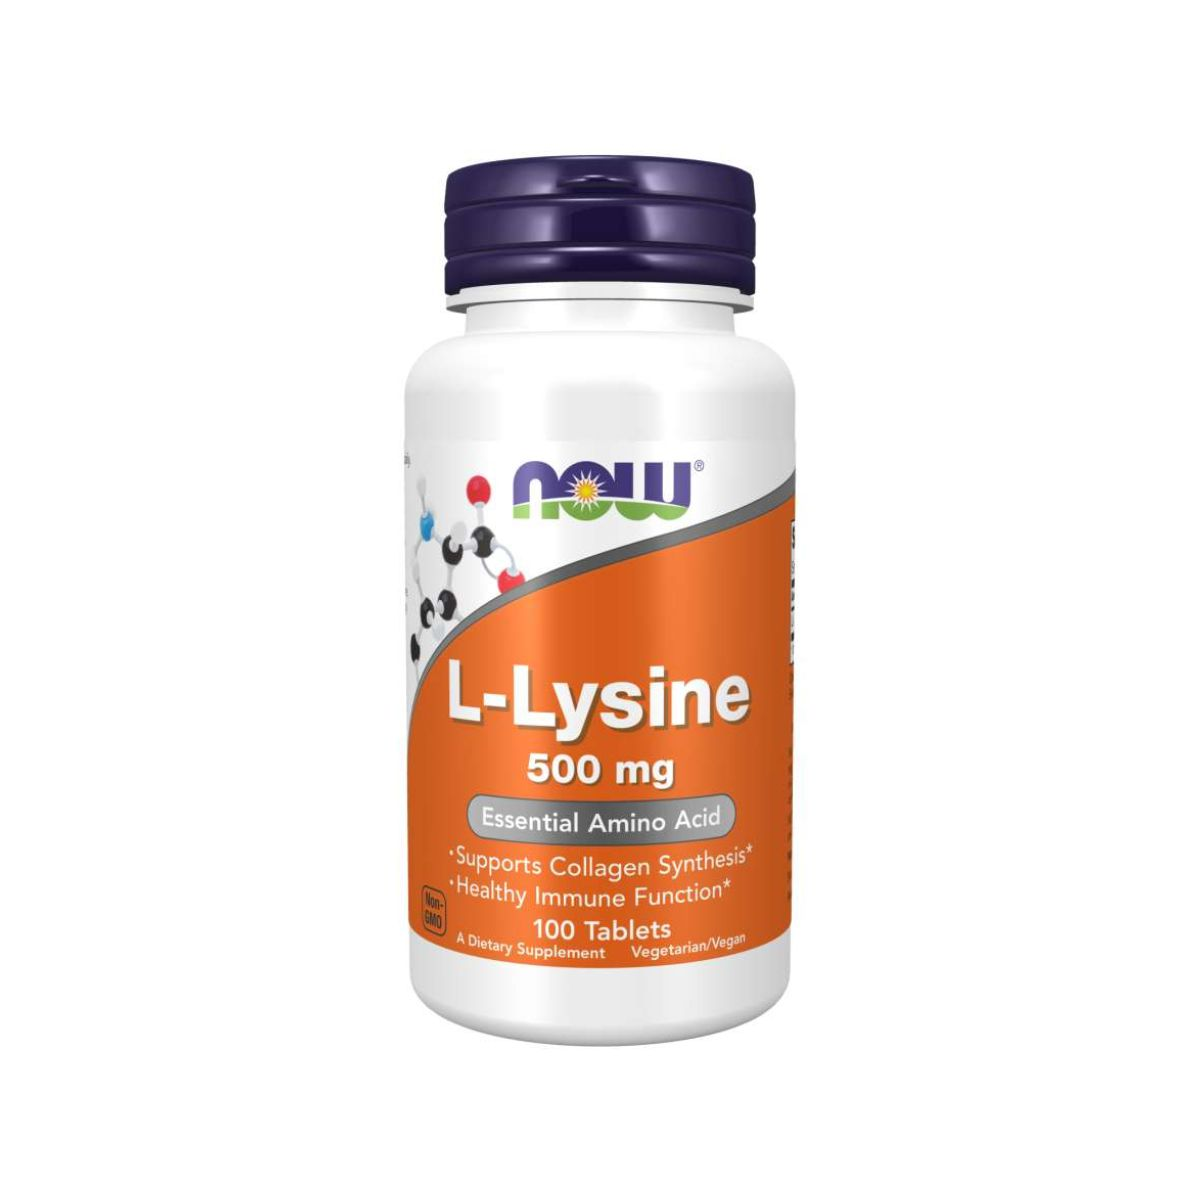 L-Lysine 500mg Essential Amino Acid 100Tabs - Now Foods